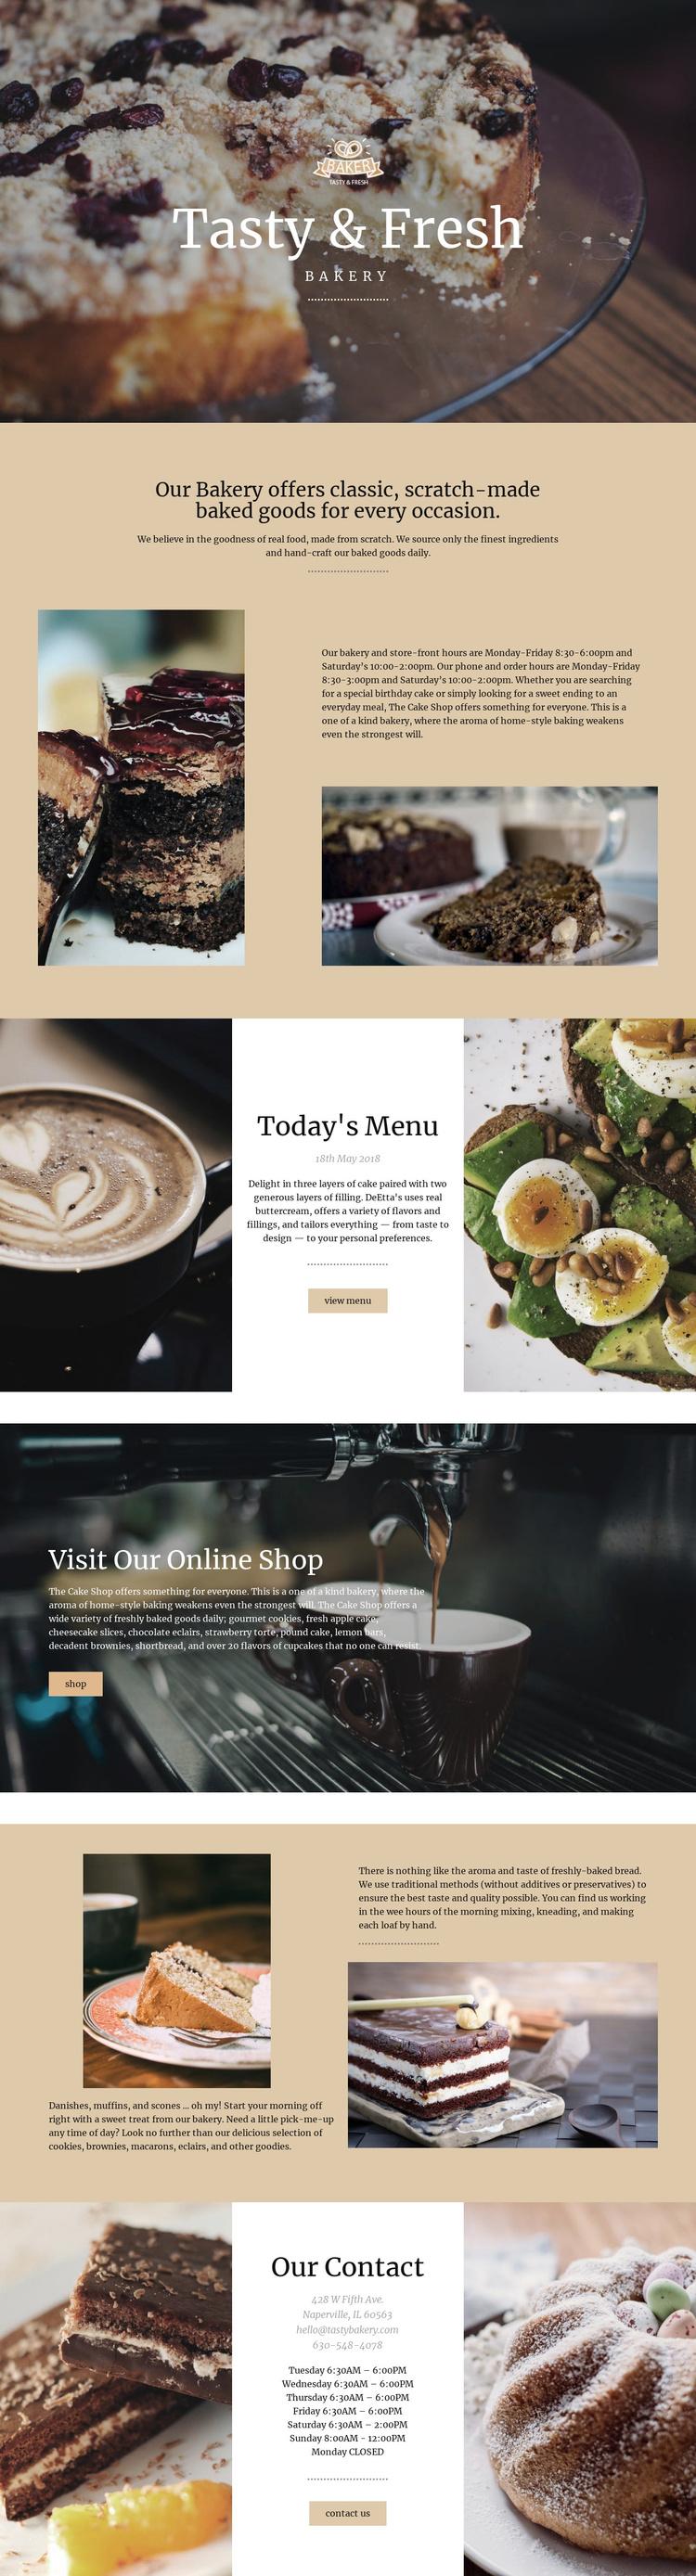 Tasty and fresh food Joomla Template